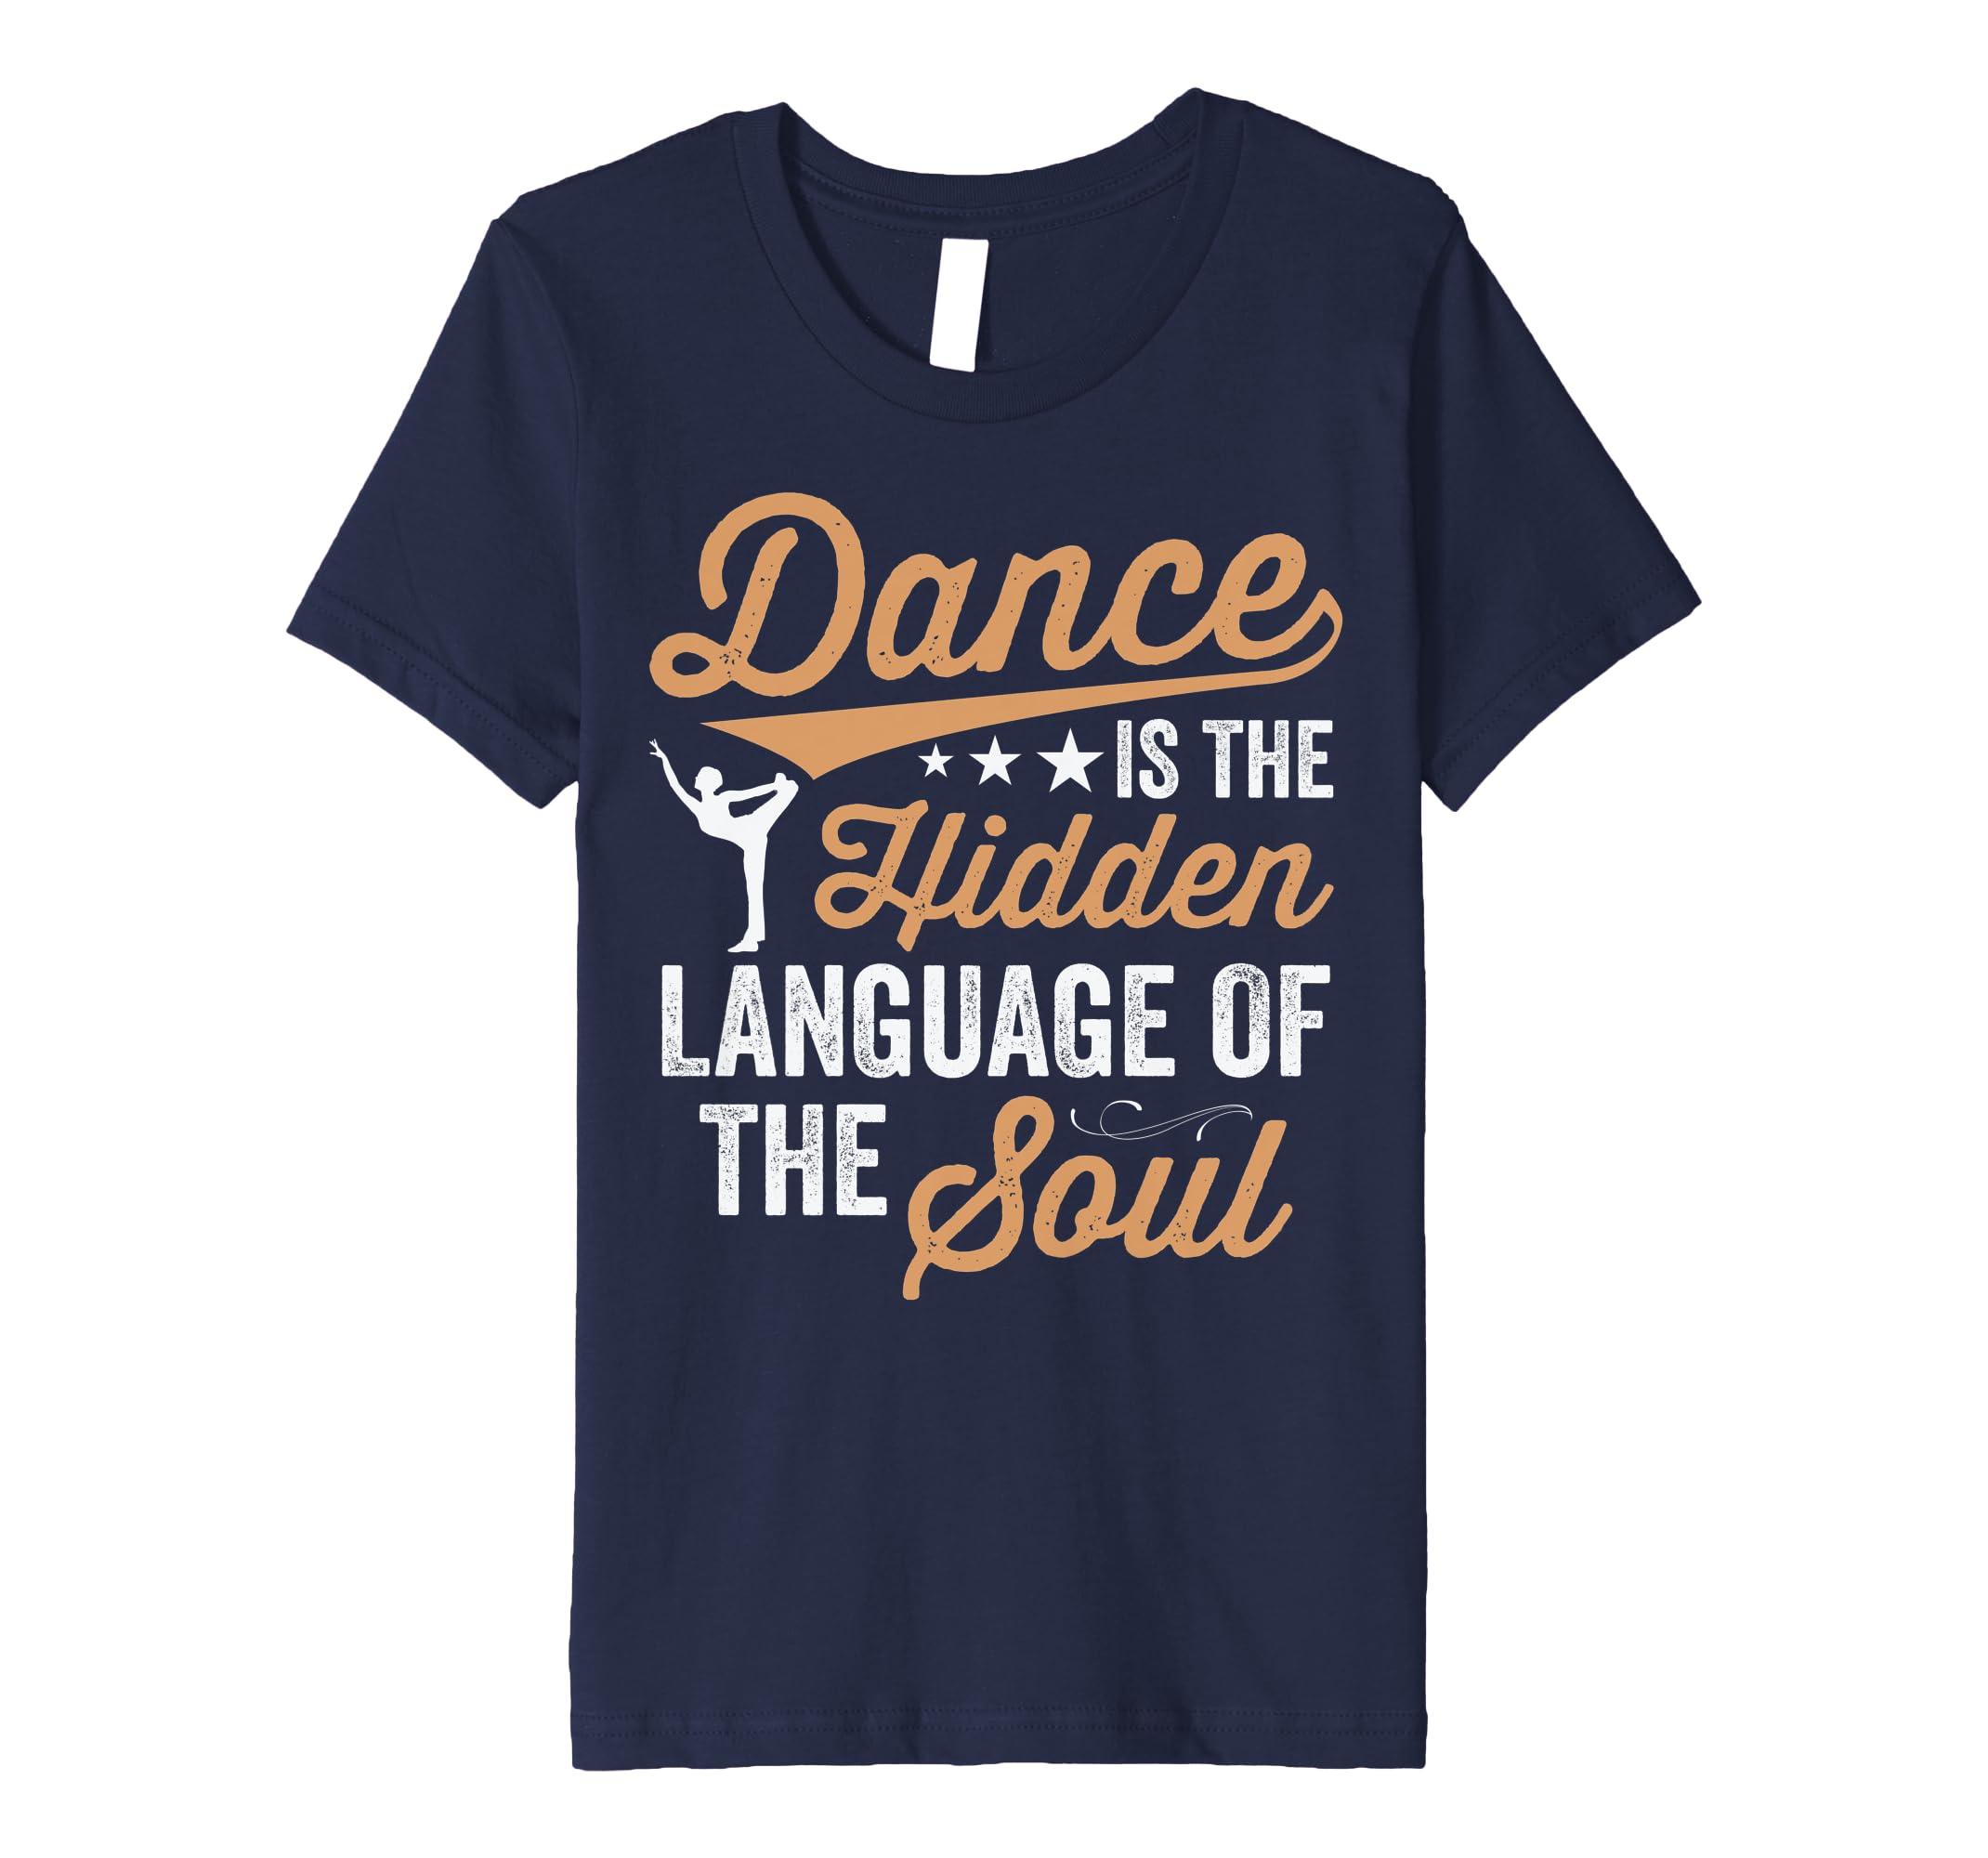 472b015b Amazon.com: Dance Tees Premium Dance T-Shirt for Girls, Teens & Women:  Clothing